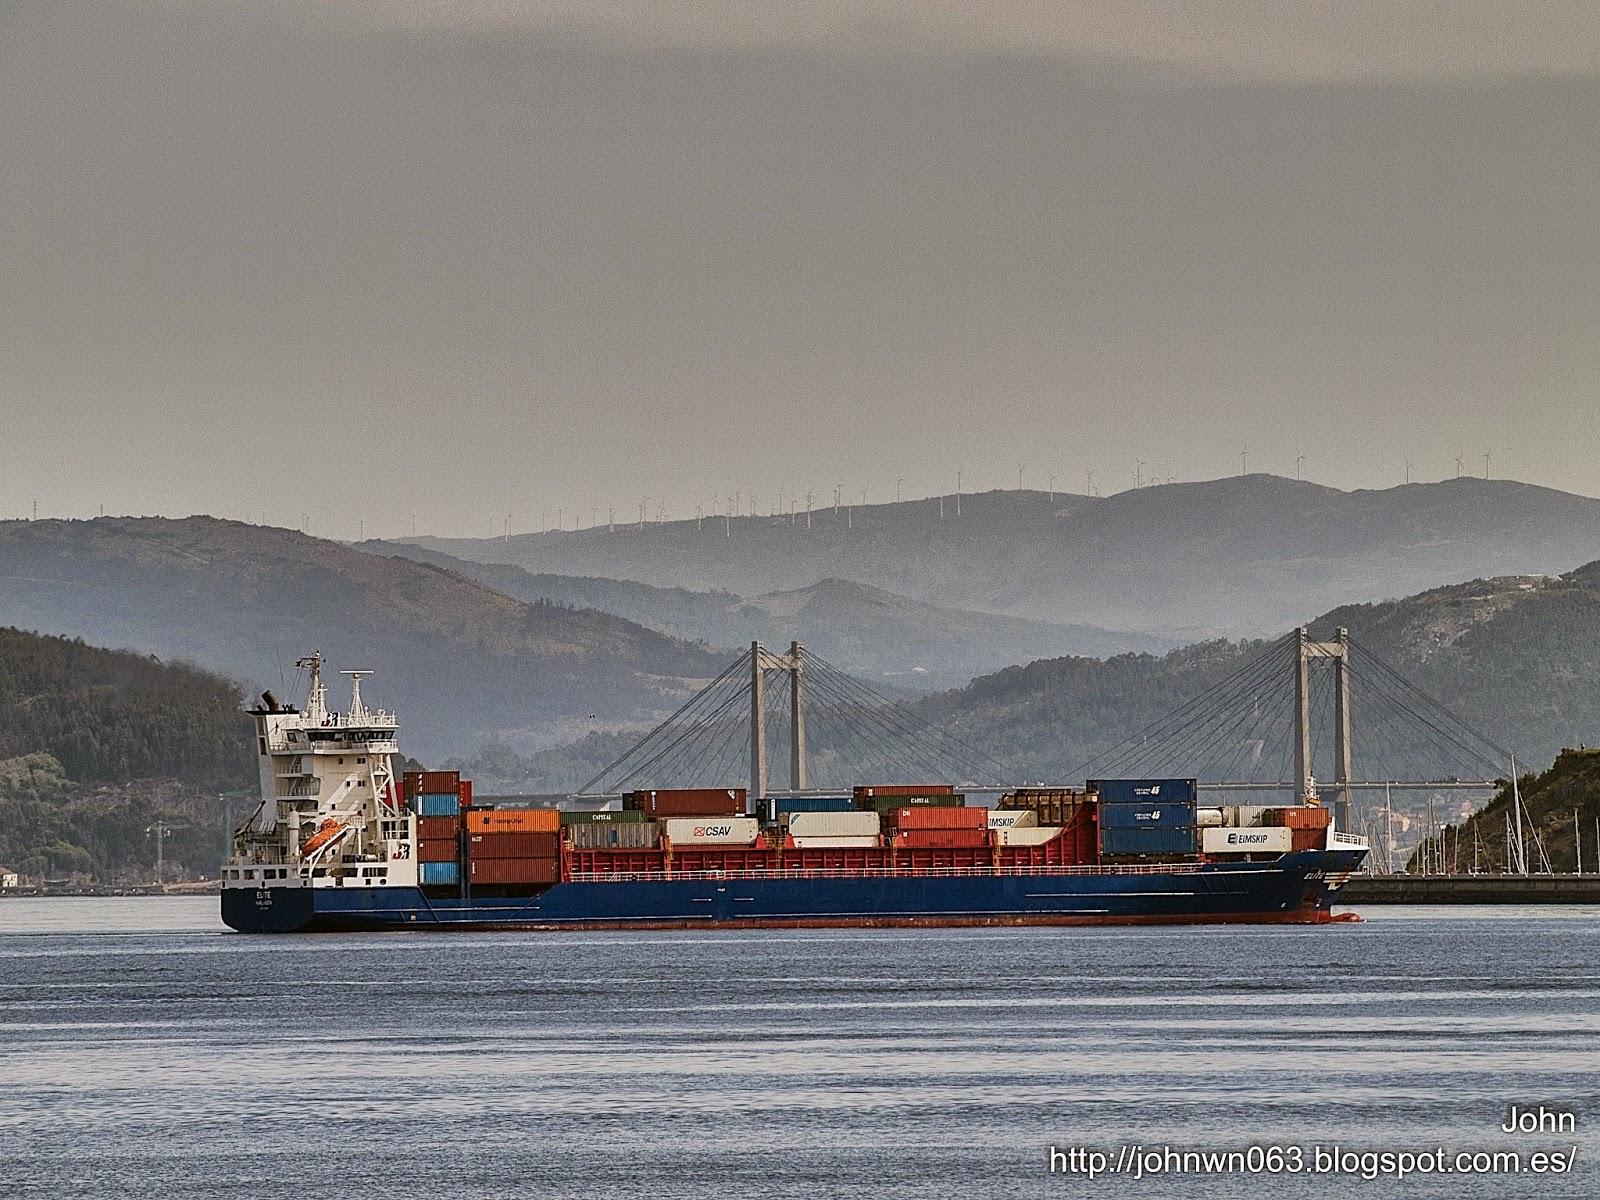 fotos de barcos, imagenes de barcos, elite, portacontenedores, containero, guixar, vigo